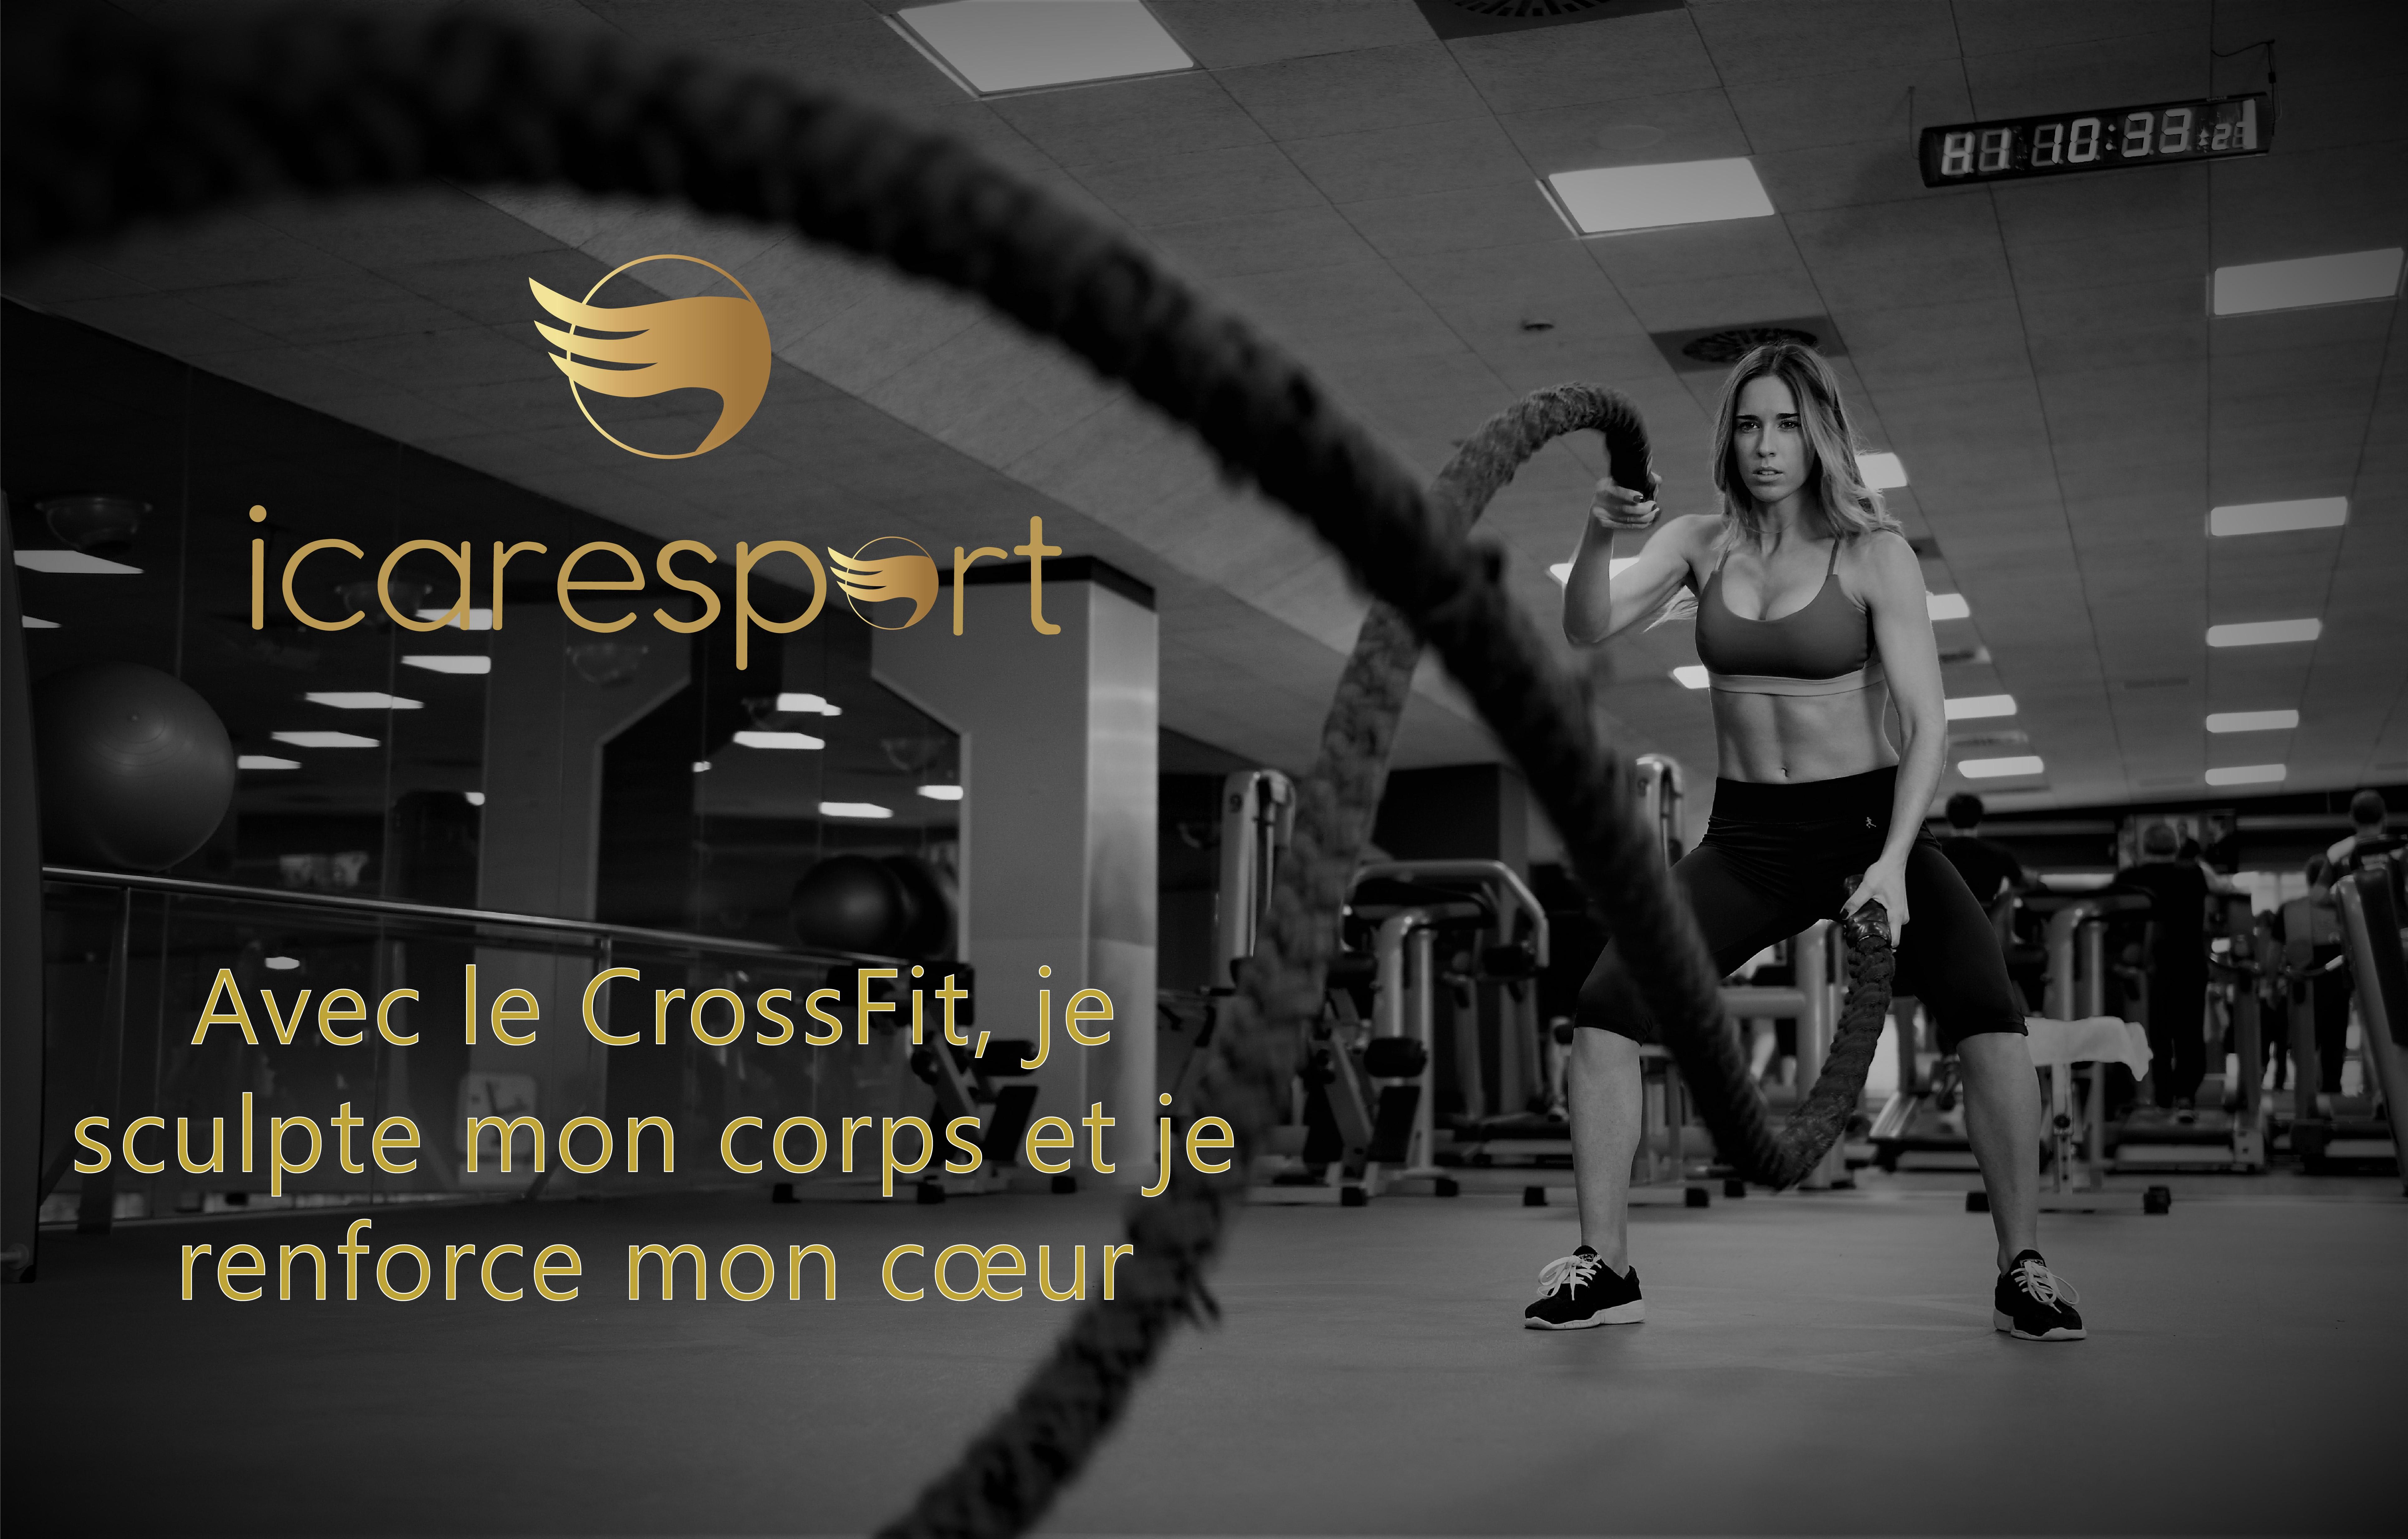 Icarespor crossfit